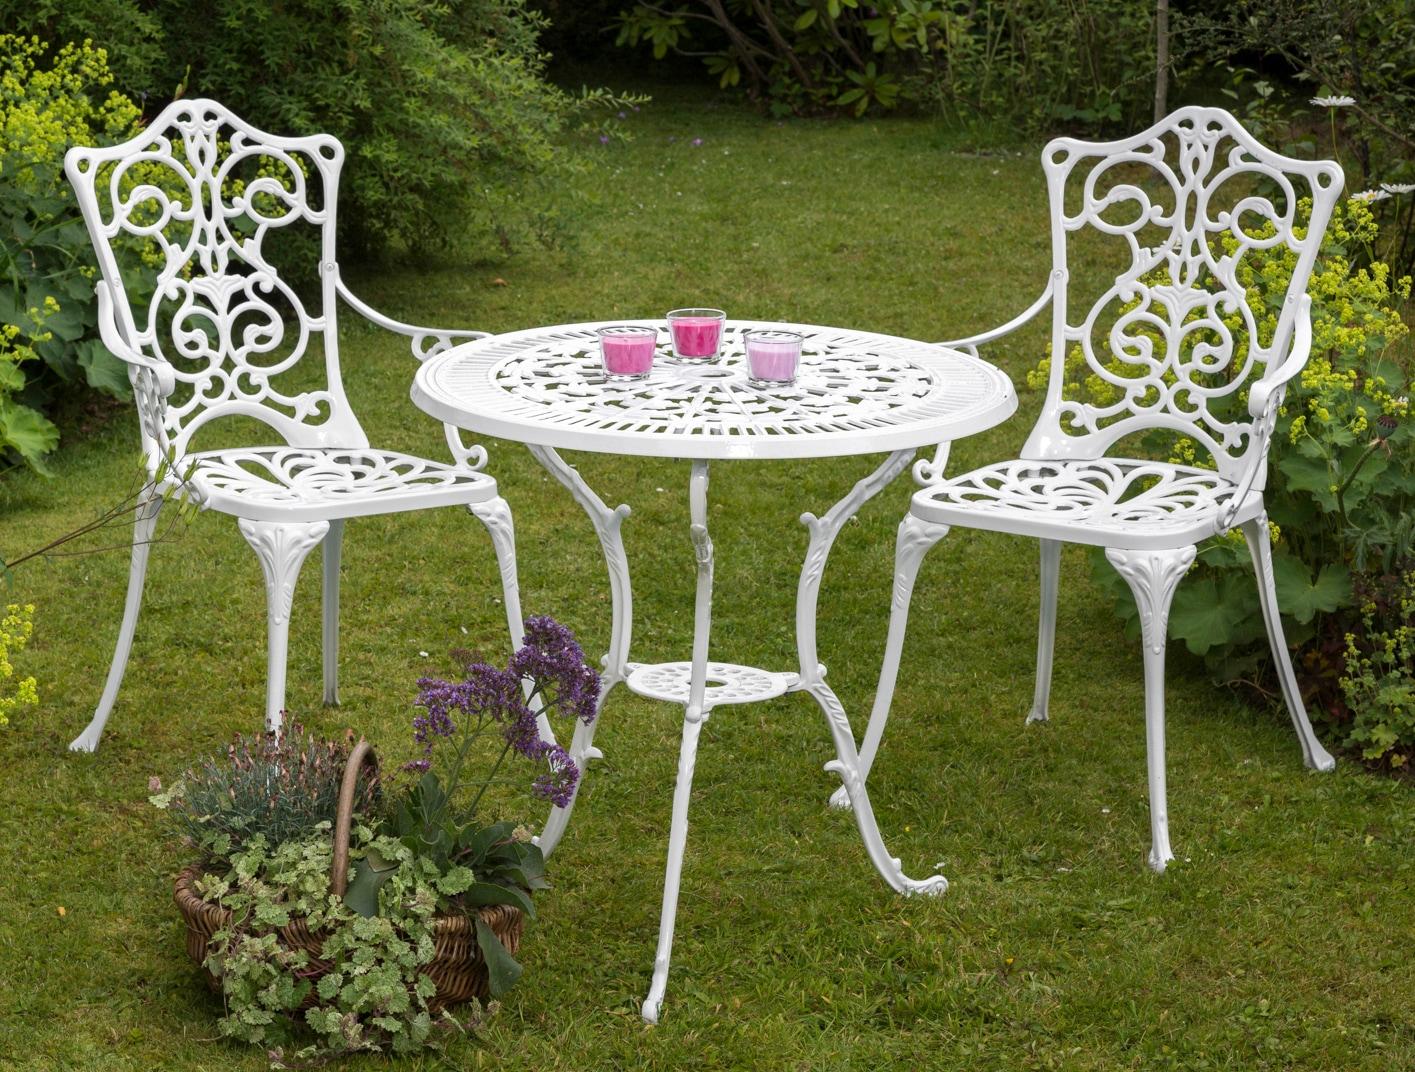 MERXX Gartenmöbelset Lugano 3tlg 2 Stühle Tisch Ø 70 Aluminium